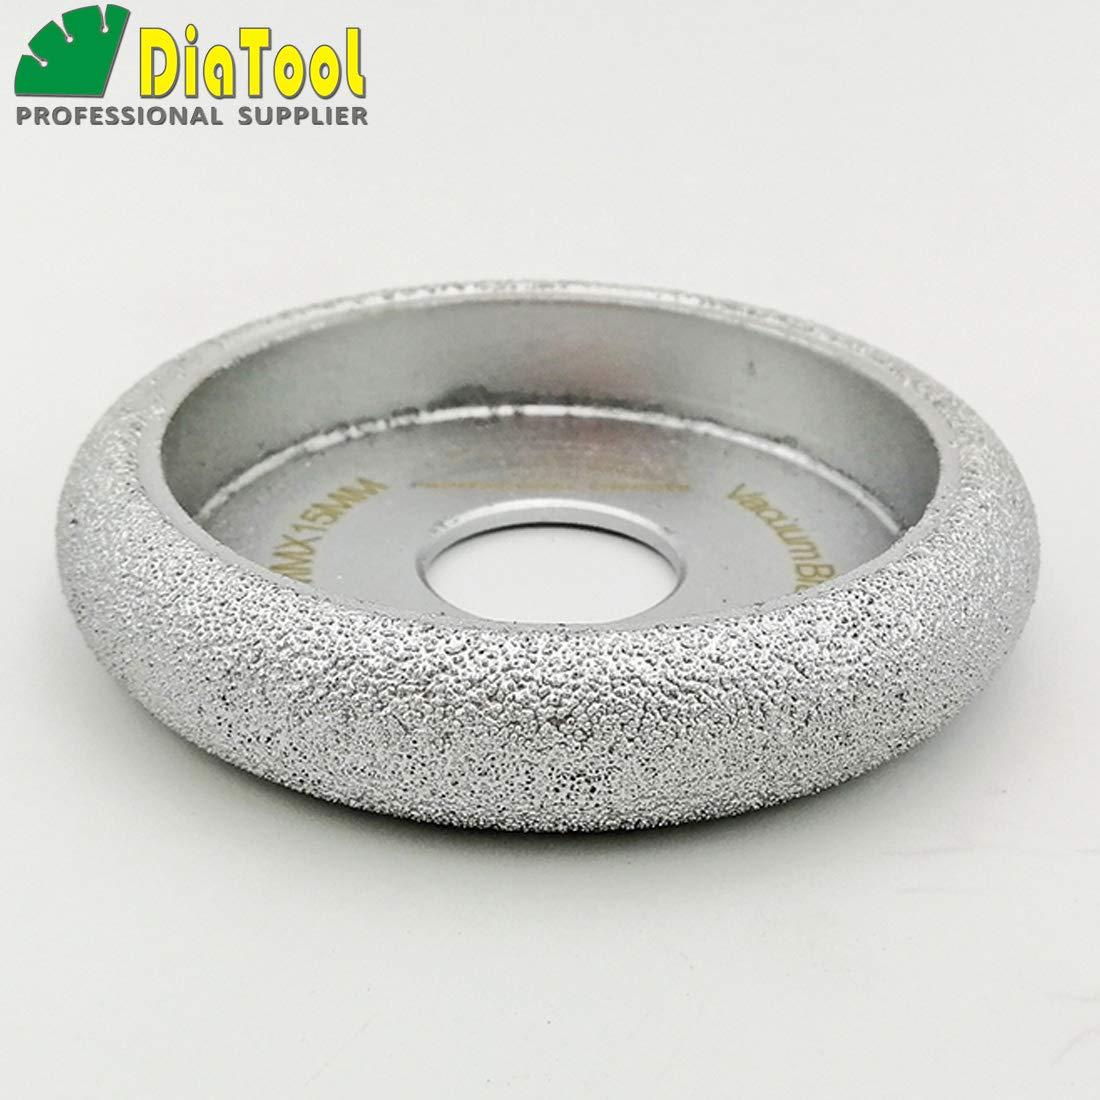 DIATOOL 3 Inch/75MM Diamond Grinding Wheel Convex Curve Brazed for Stone Abrasive Grinding disc Vacuum Brazed Profile Hand Diamond Wheel Grit 60 (Diamond Height 10mm) SHANGHAI DIATOOL CO. LTD.